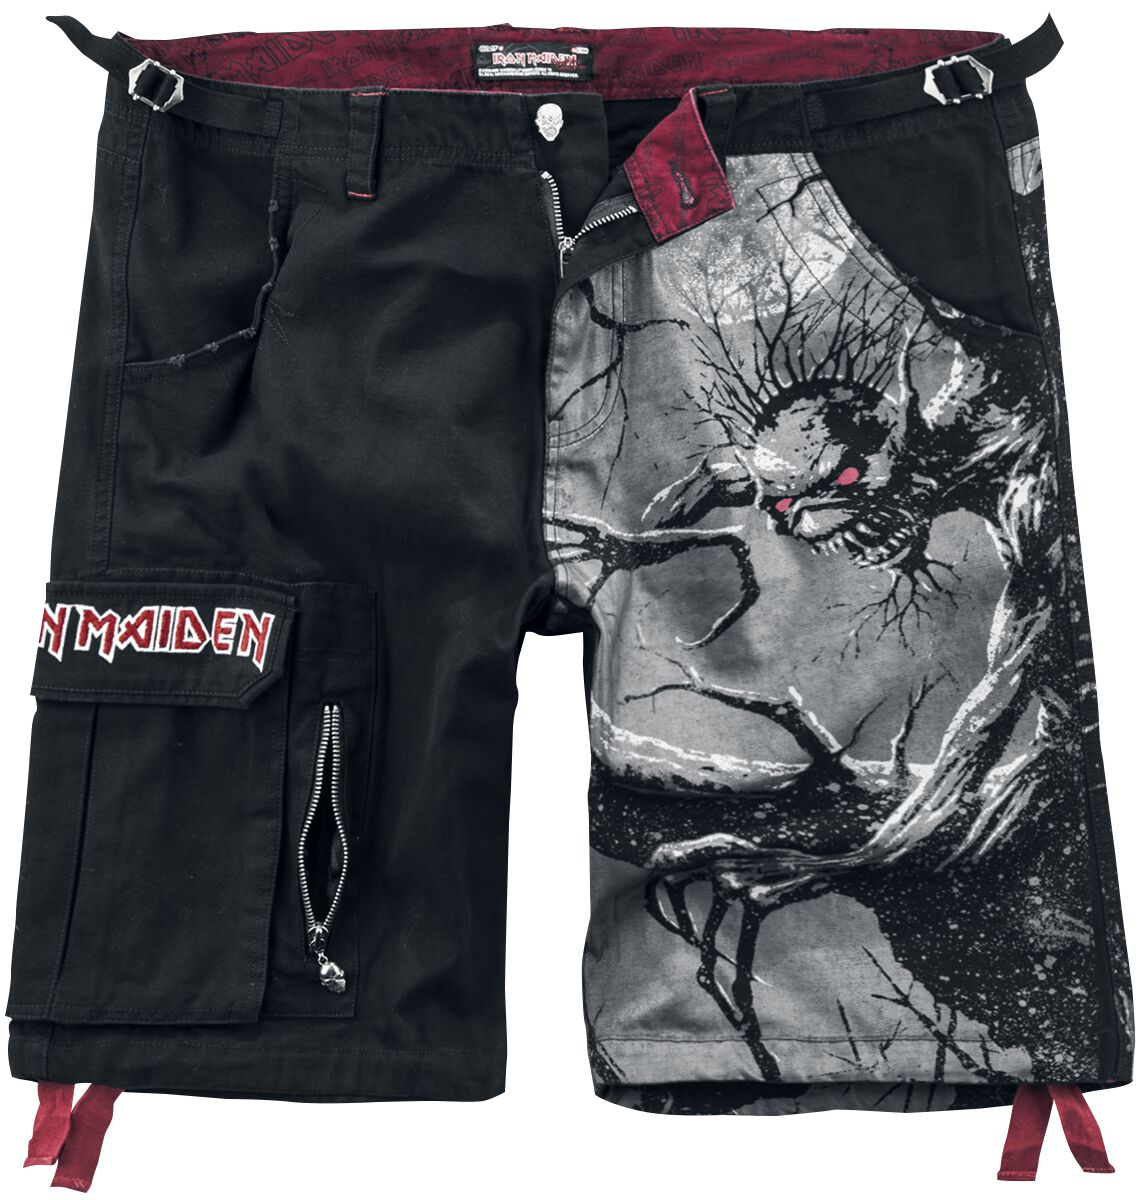 16a59f42f8 EMP Signature Collection | Iron Maiden Shorts | EMP